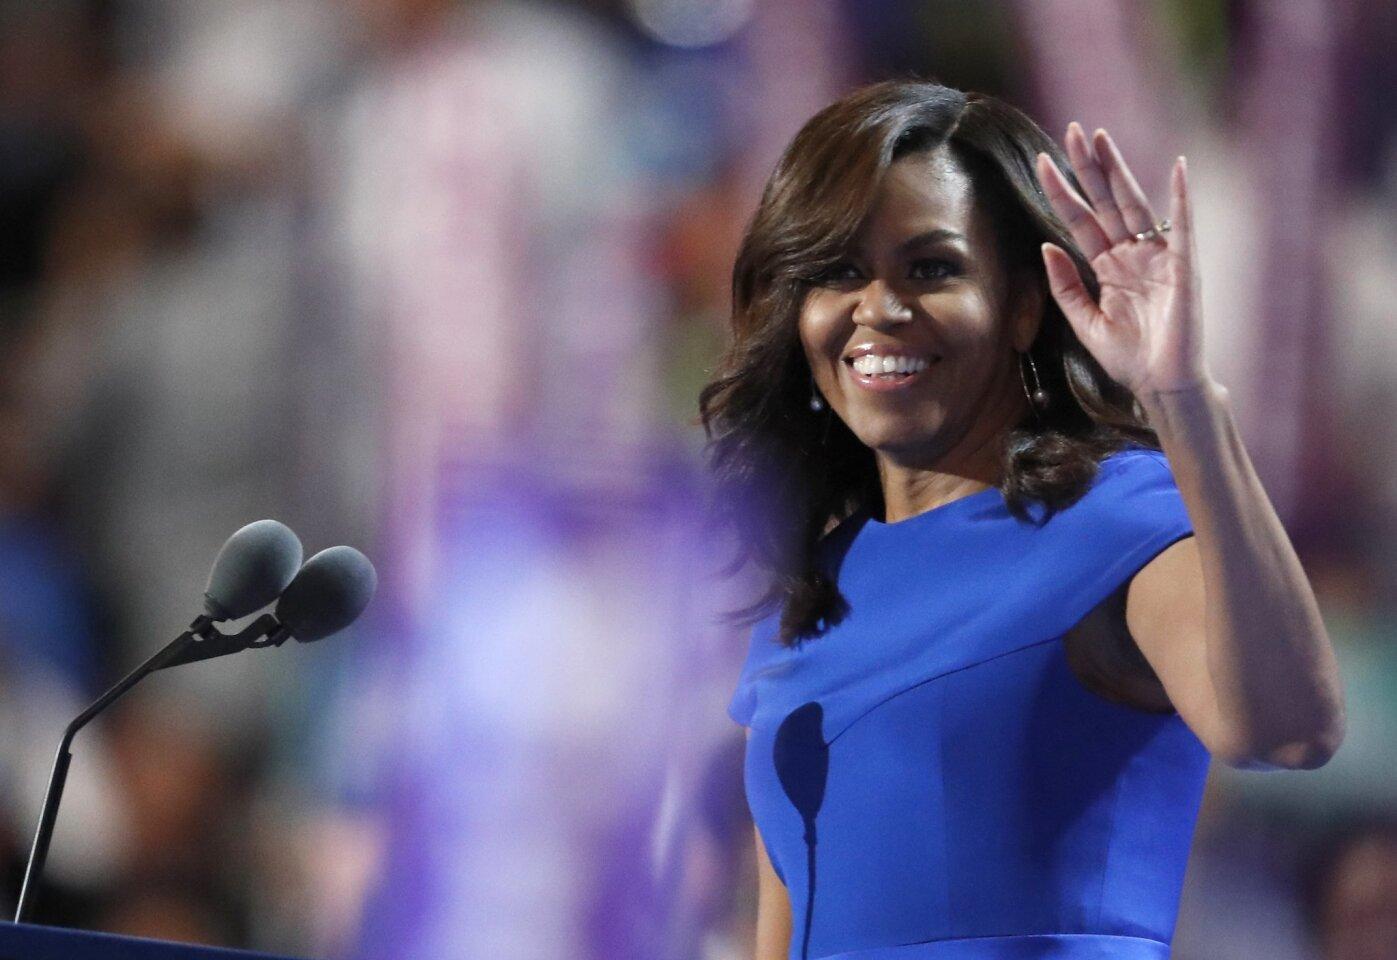 Michelle Obama's inspirational speech